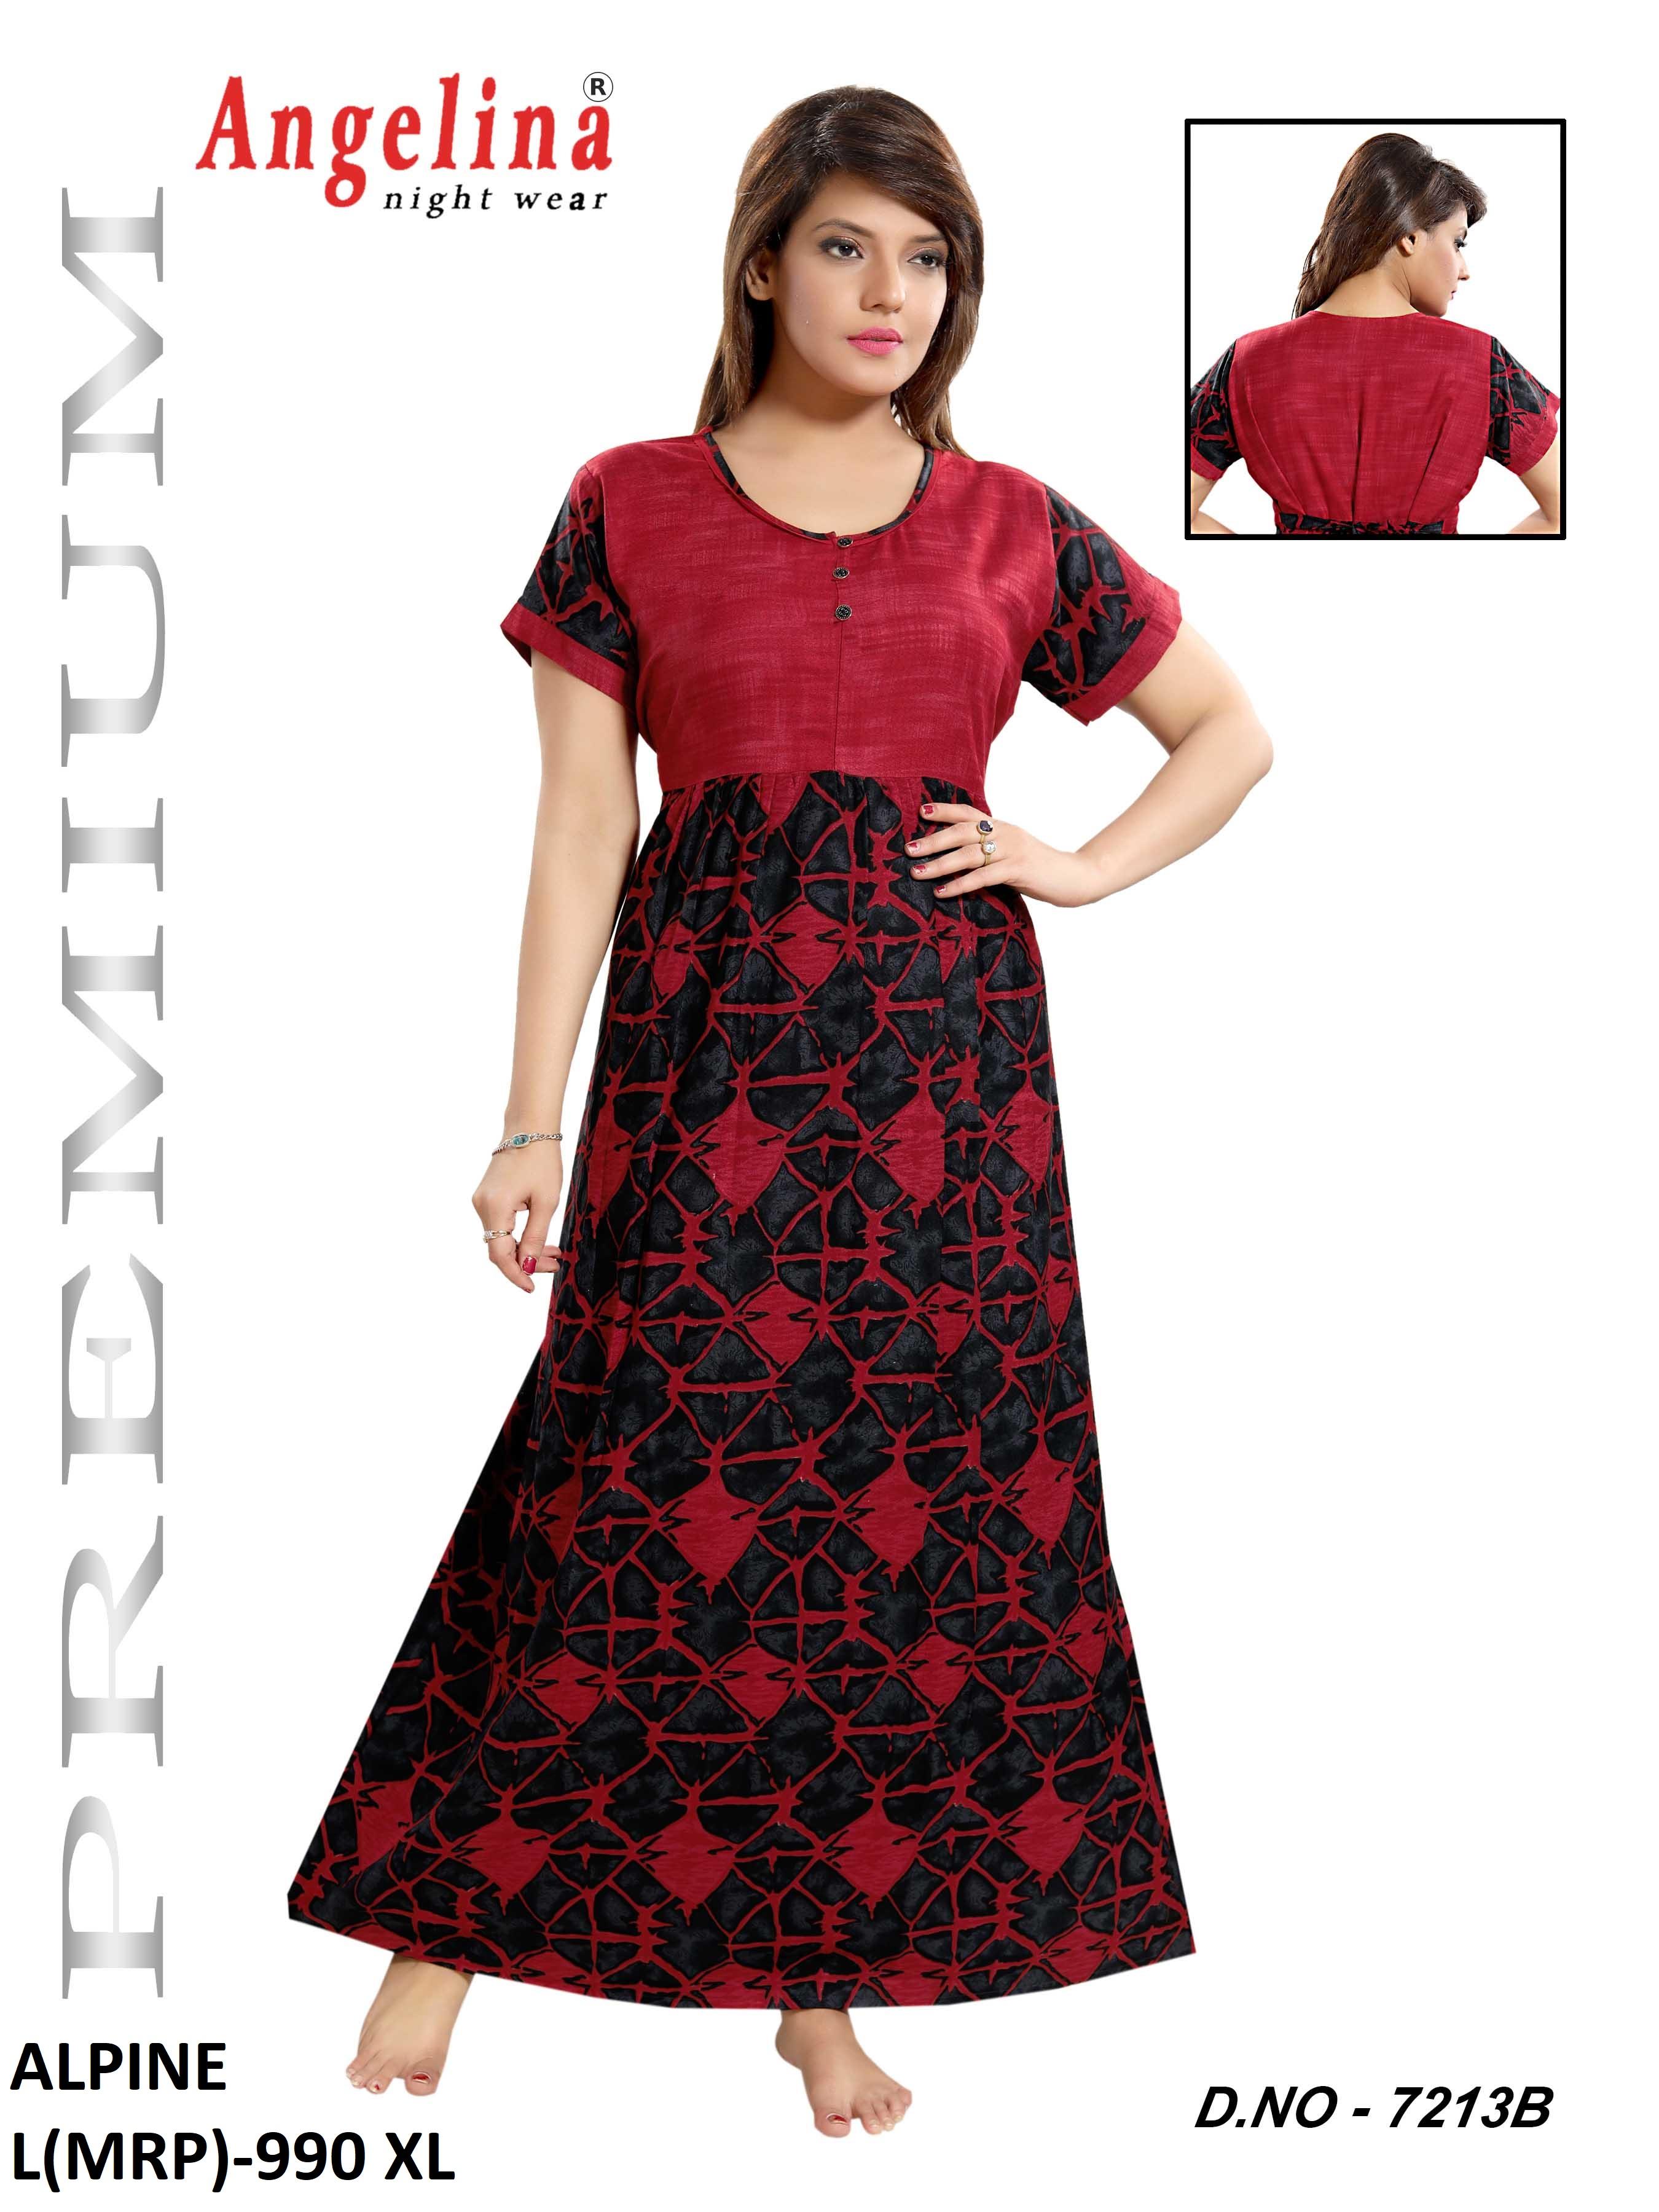 c6edc1667b Ladies Hosiery Night Suit Gown   Angelina Lifestyle - Brand of ...